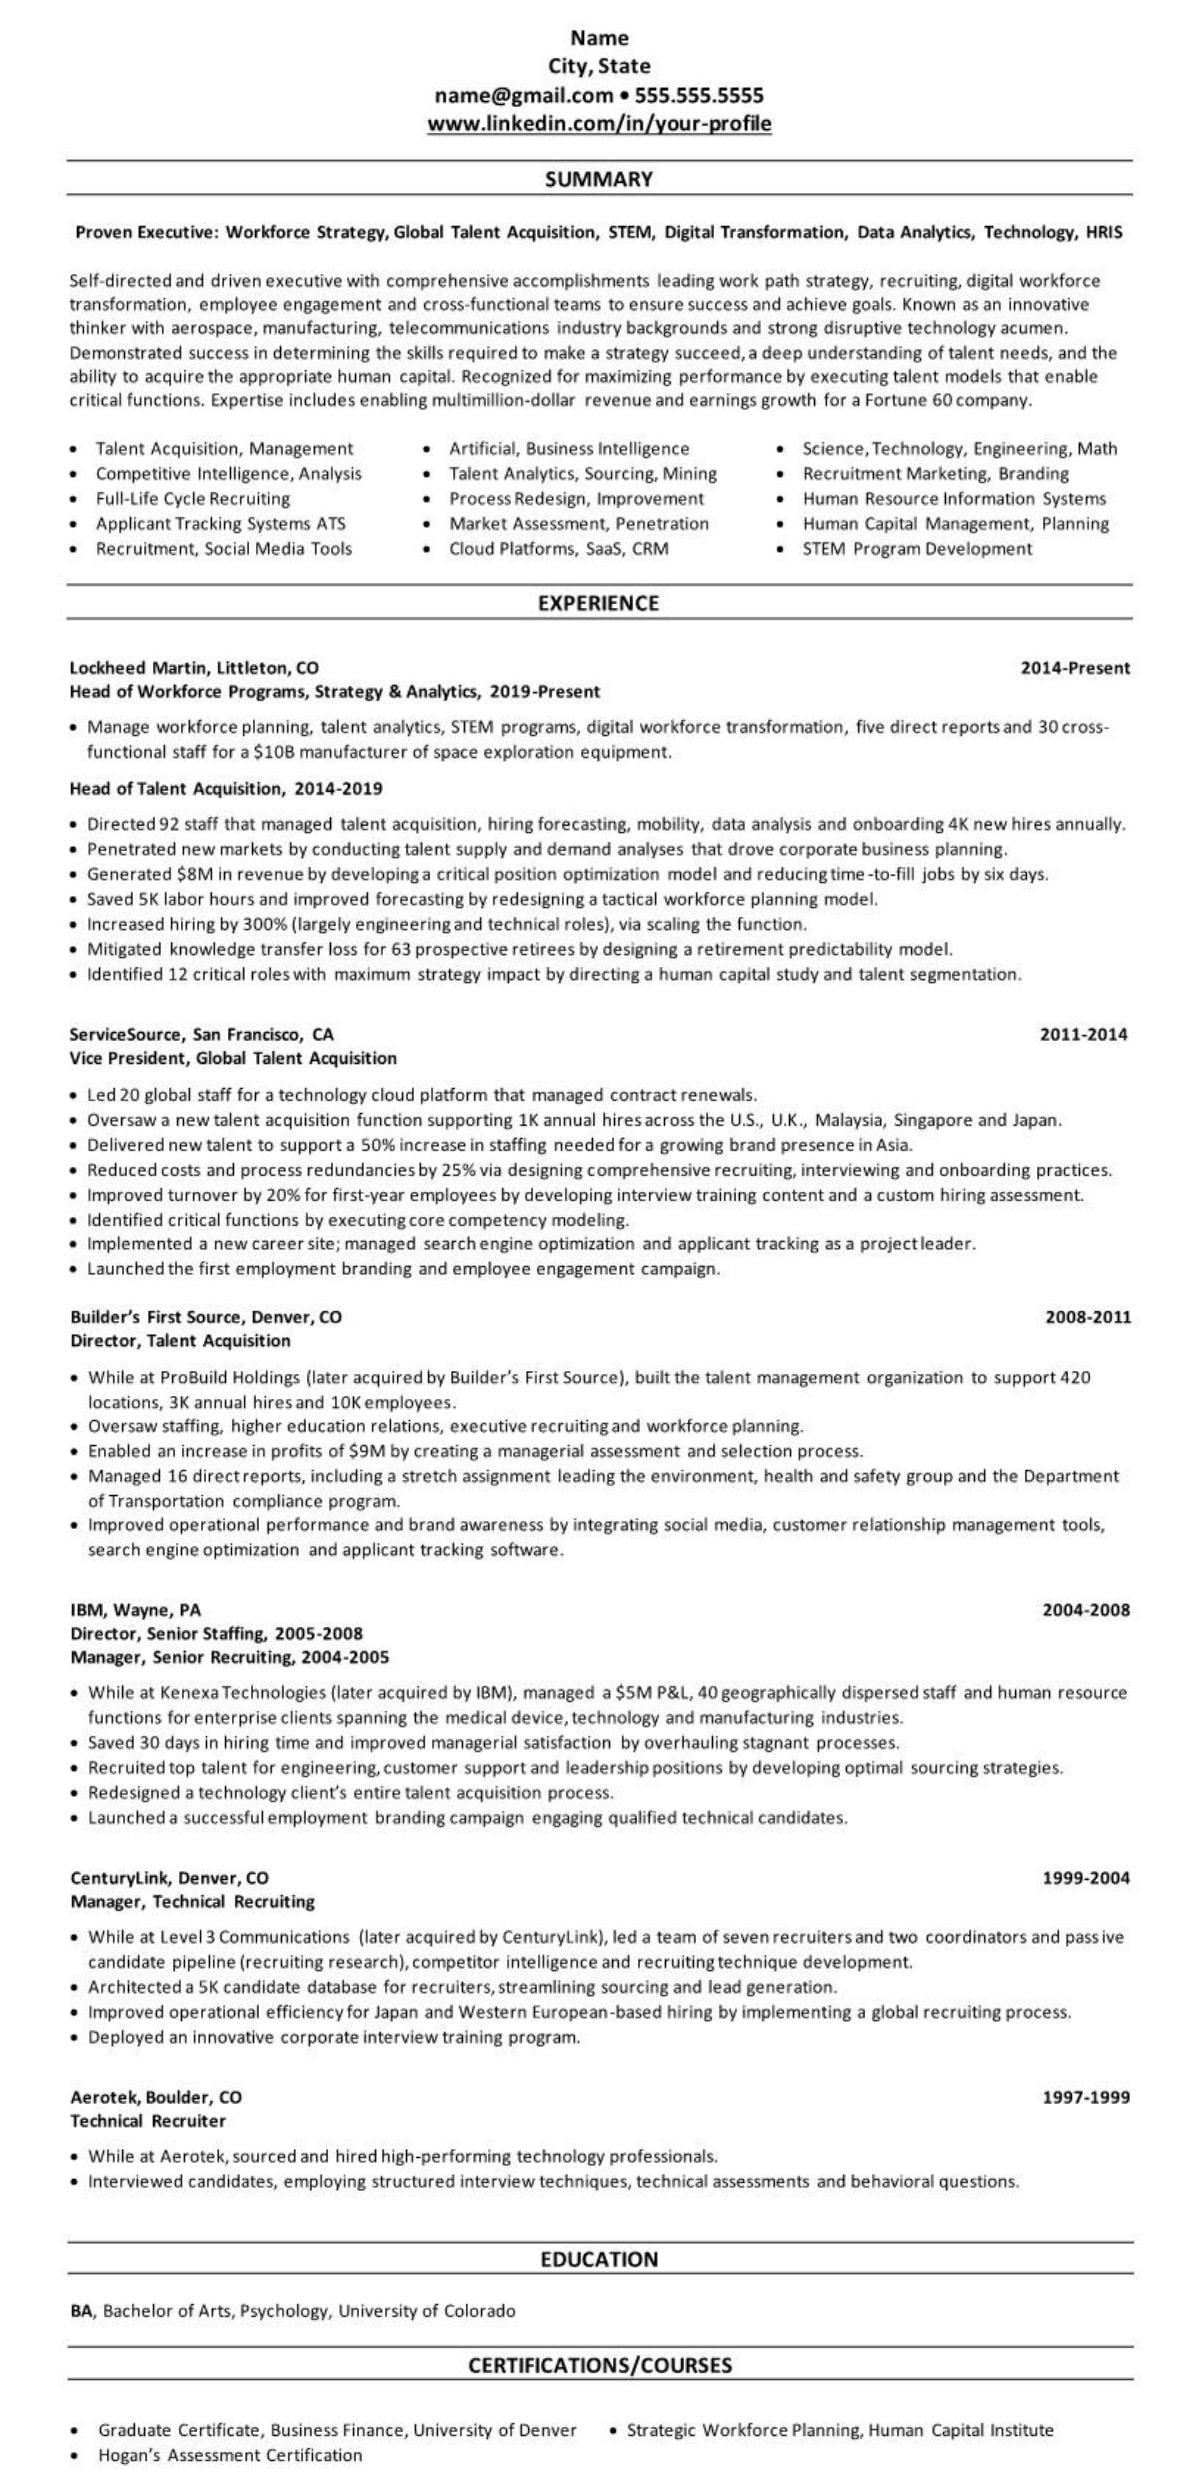 Resume 2672